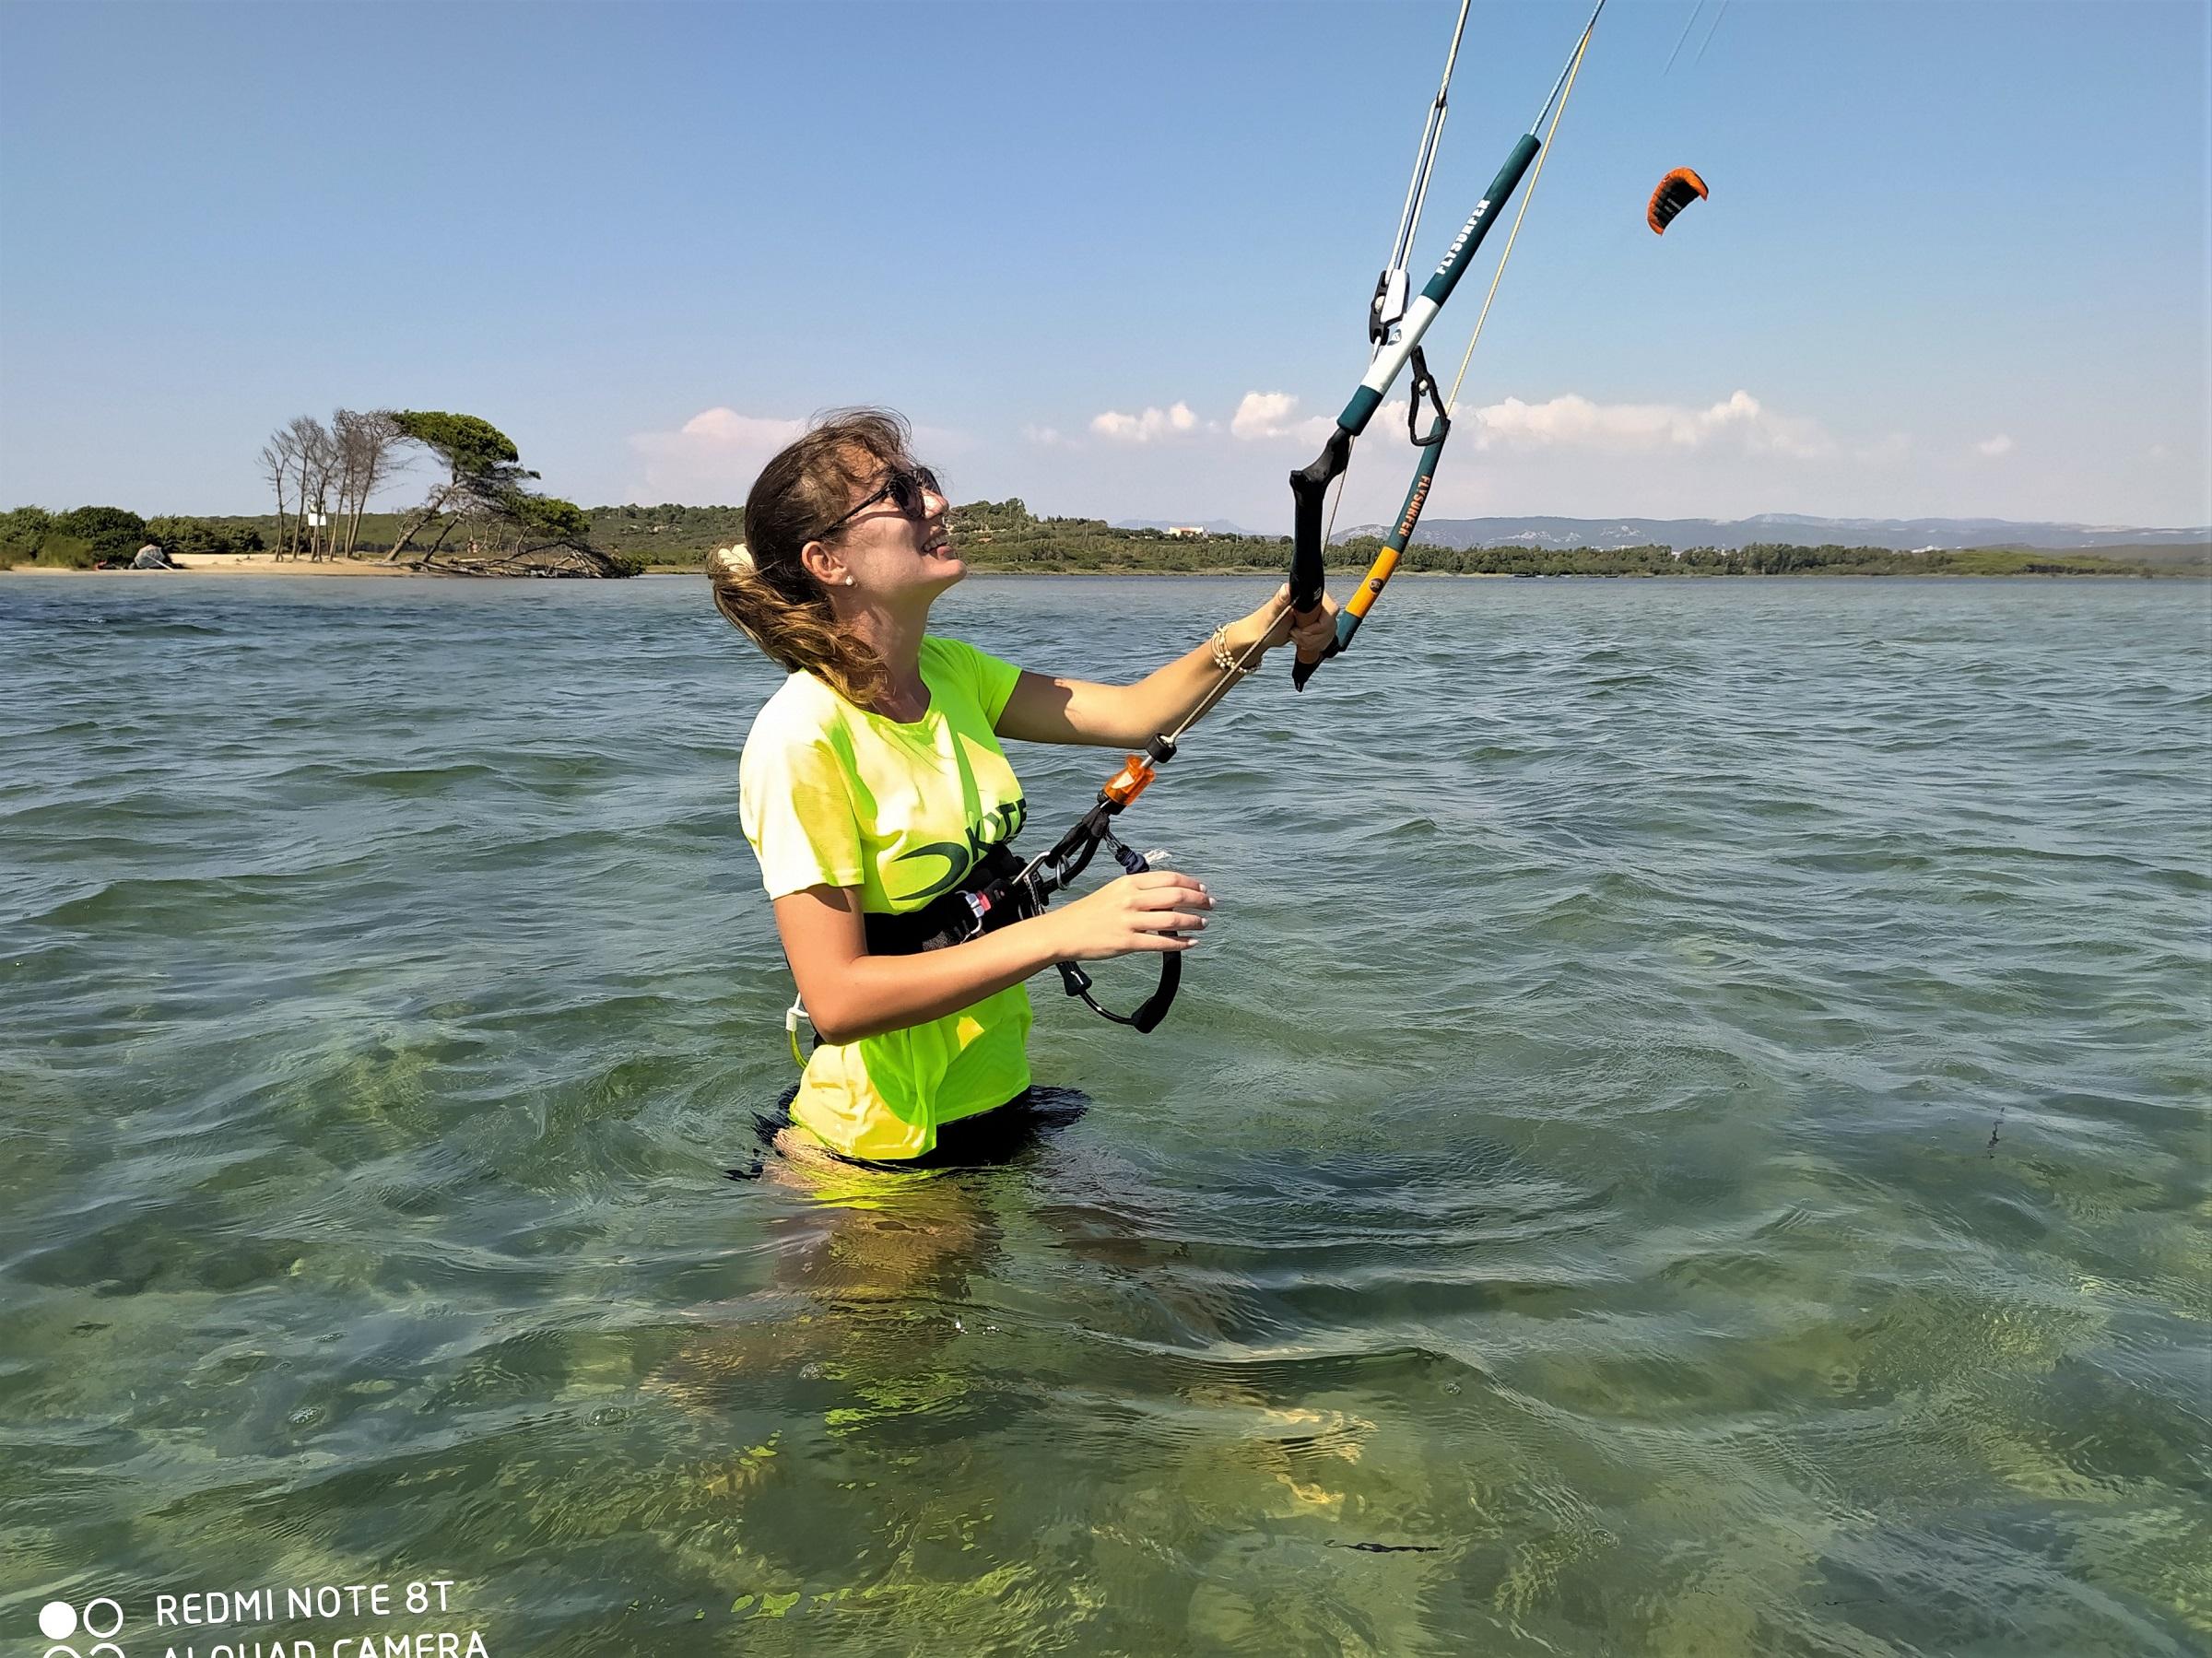 Learning Kitesurf at Punta Trettu Kite Beach with shallow and Flat Water